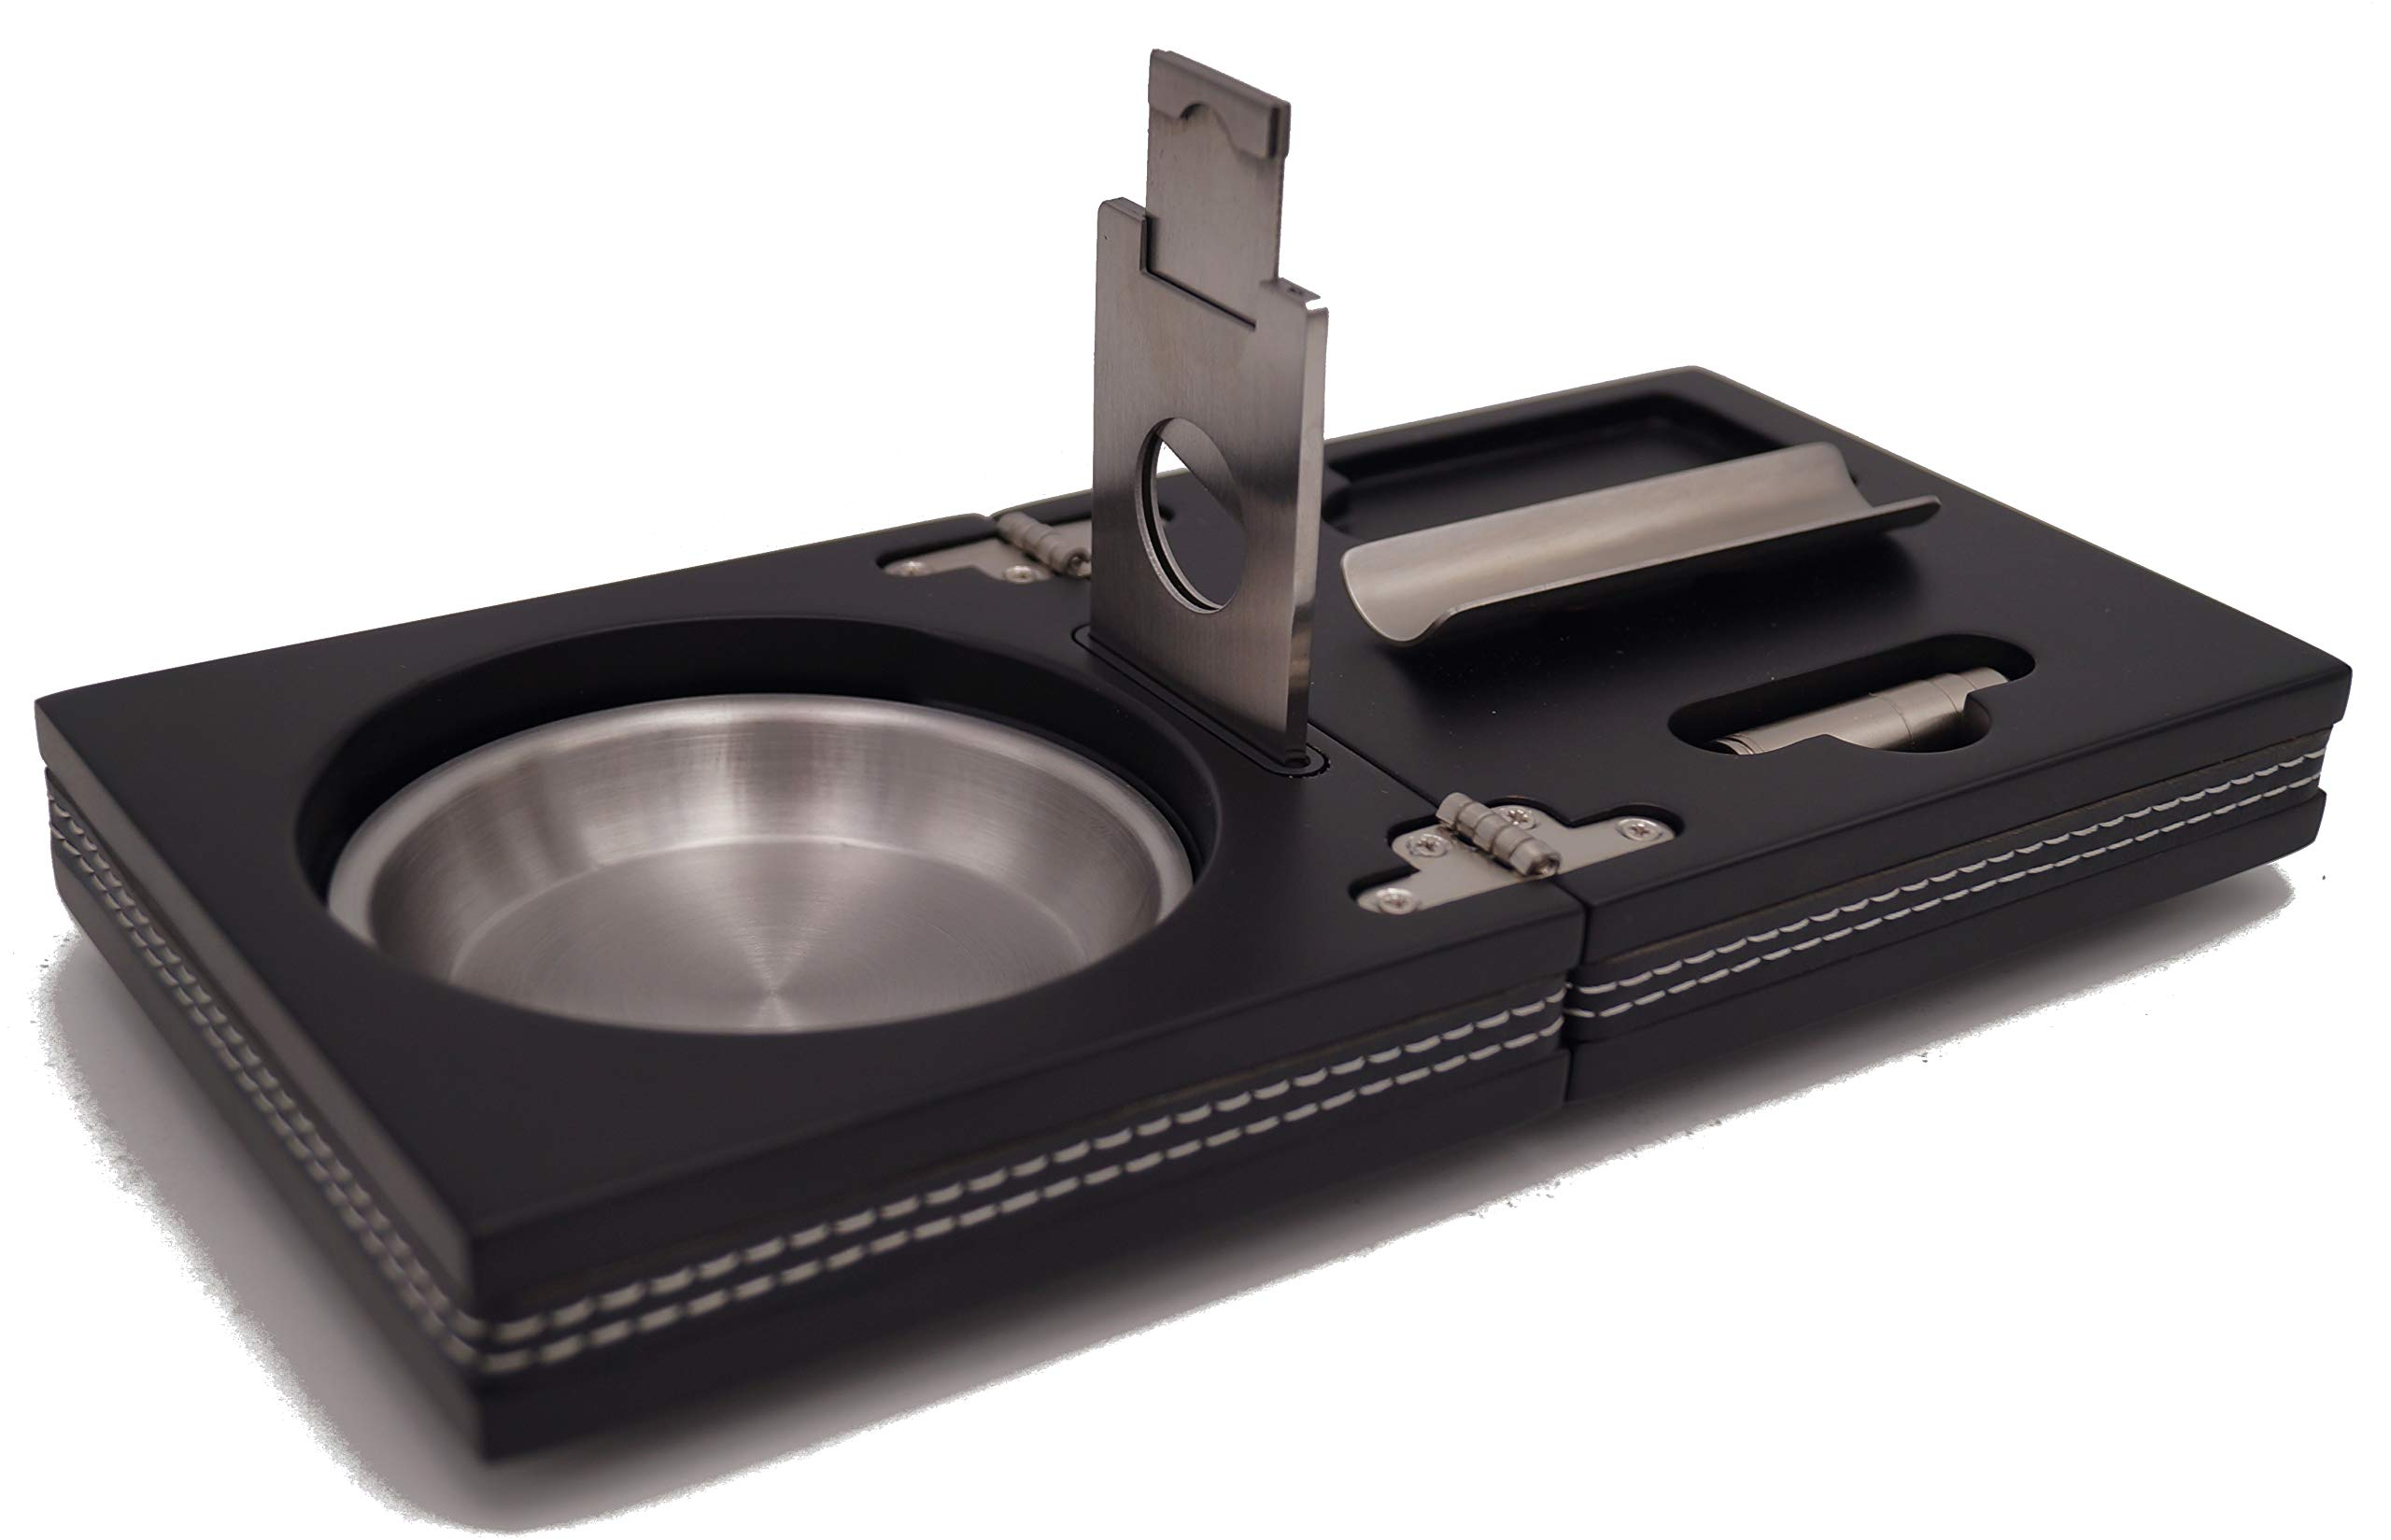 GERMANUS - The Box - Set of Cigar Ashtray Cutter Punch Holder, Black